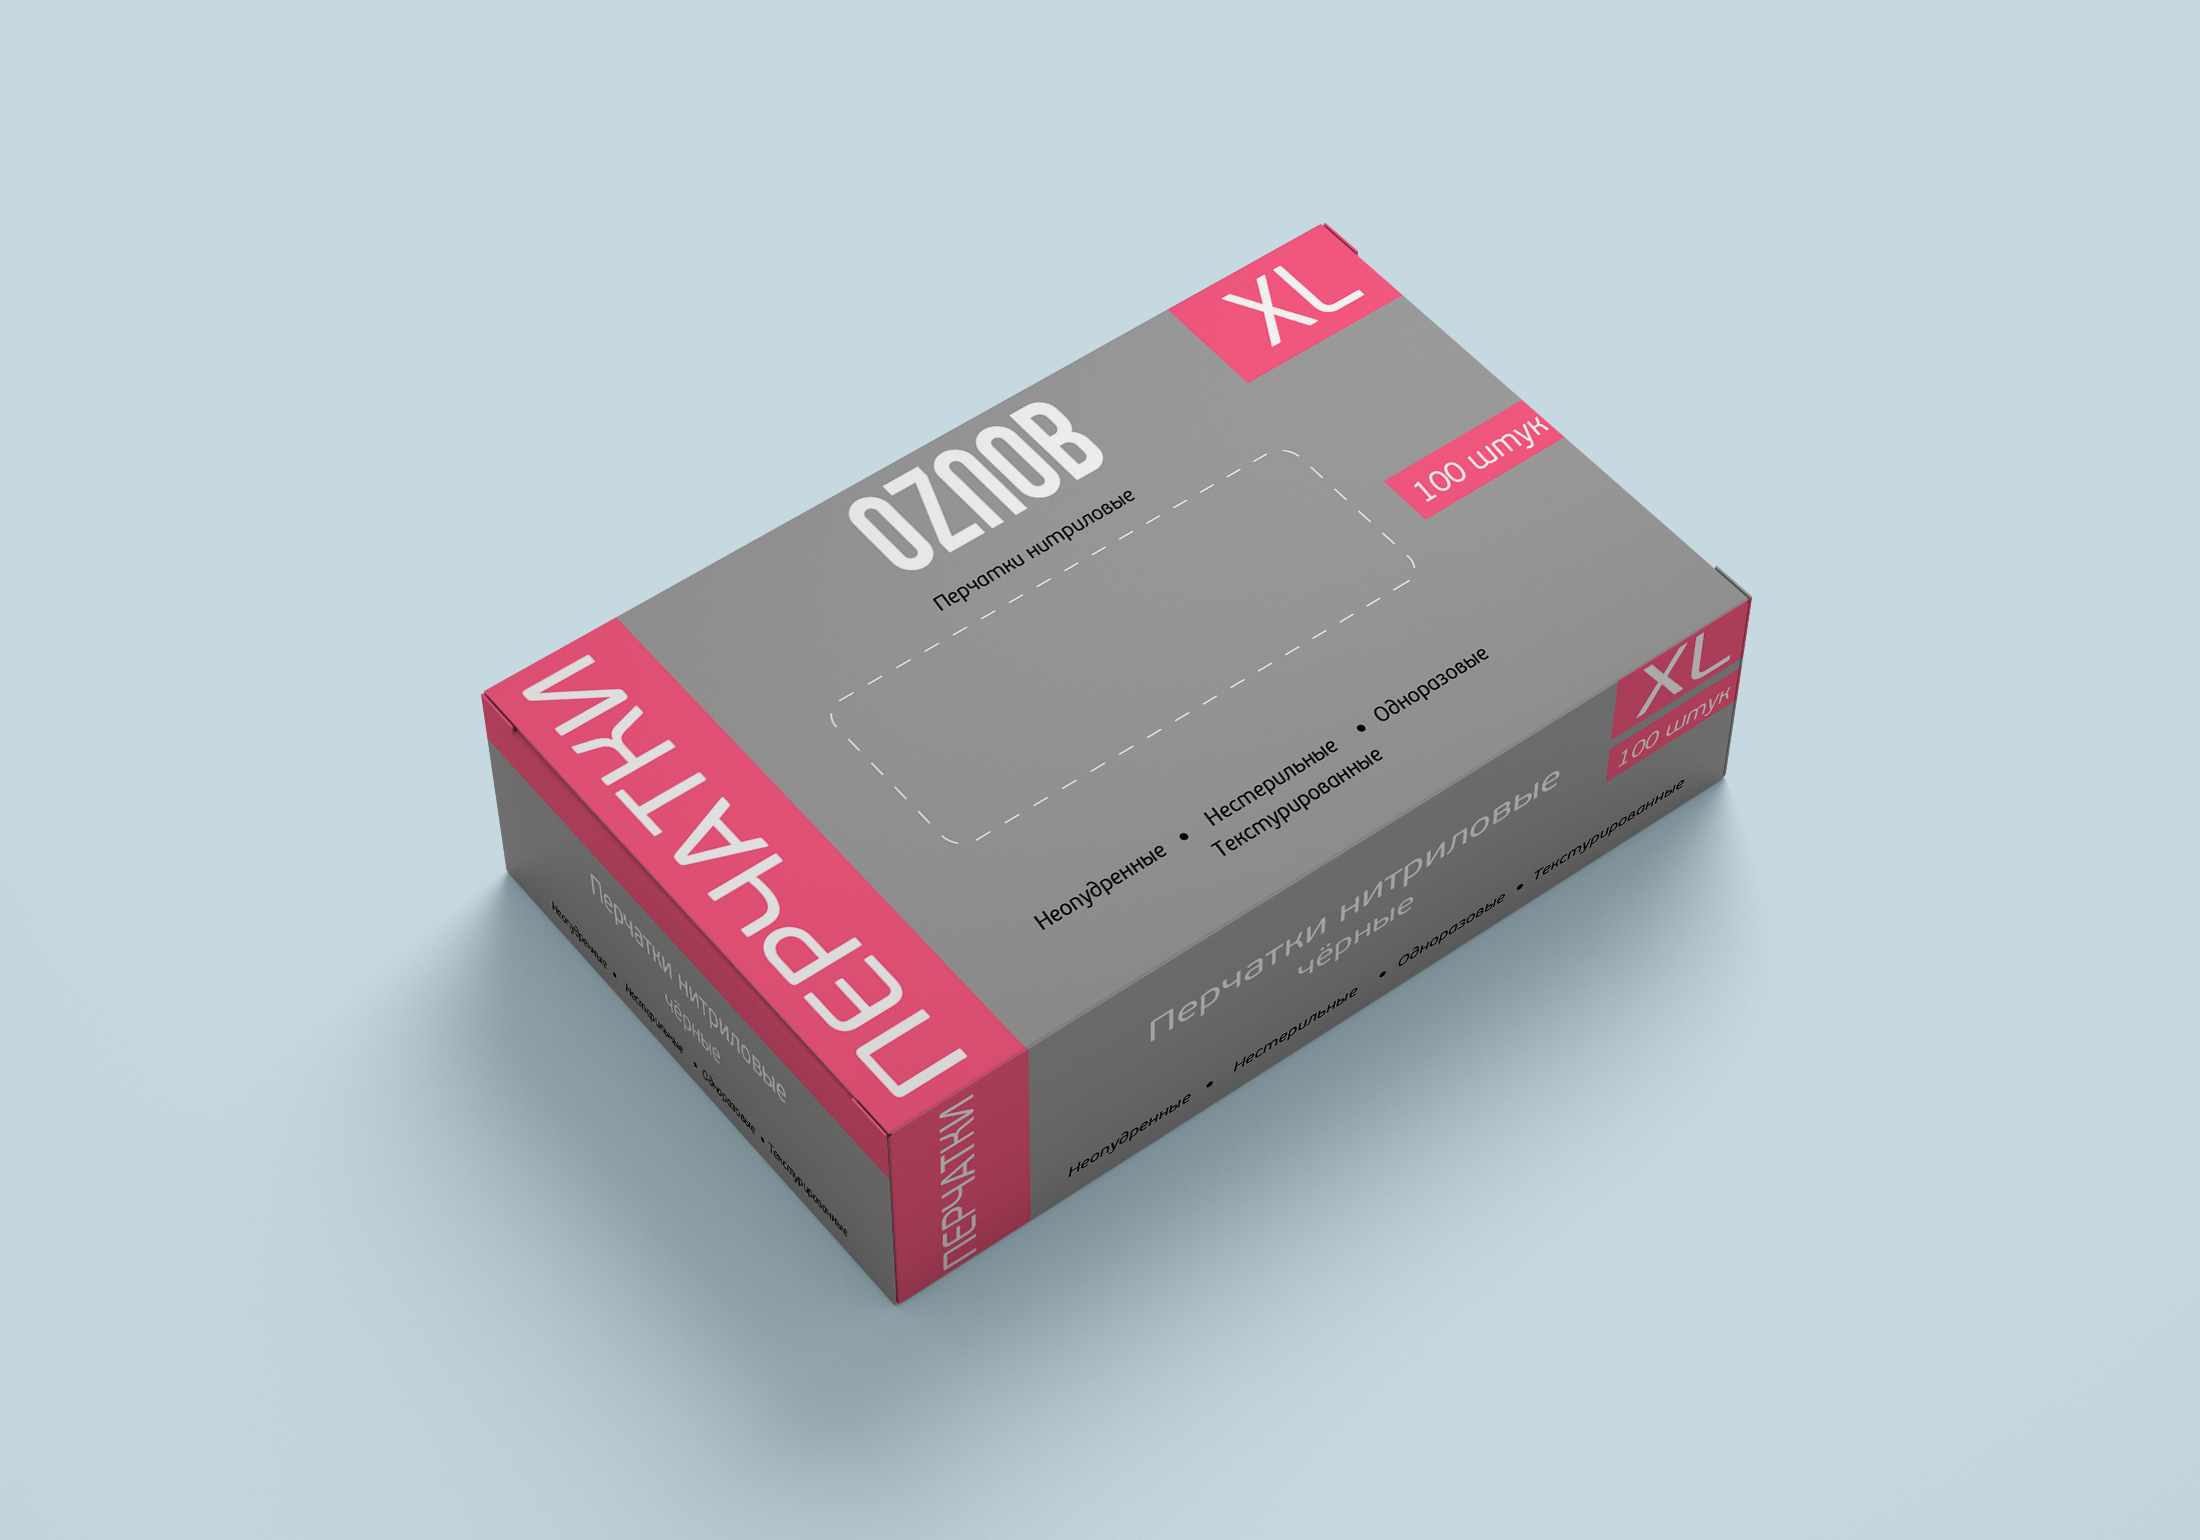 дизайн упаковки (коробка размером 250*150*60 мм)для перчаток фото f_8045ef08c96a56e5.png